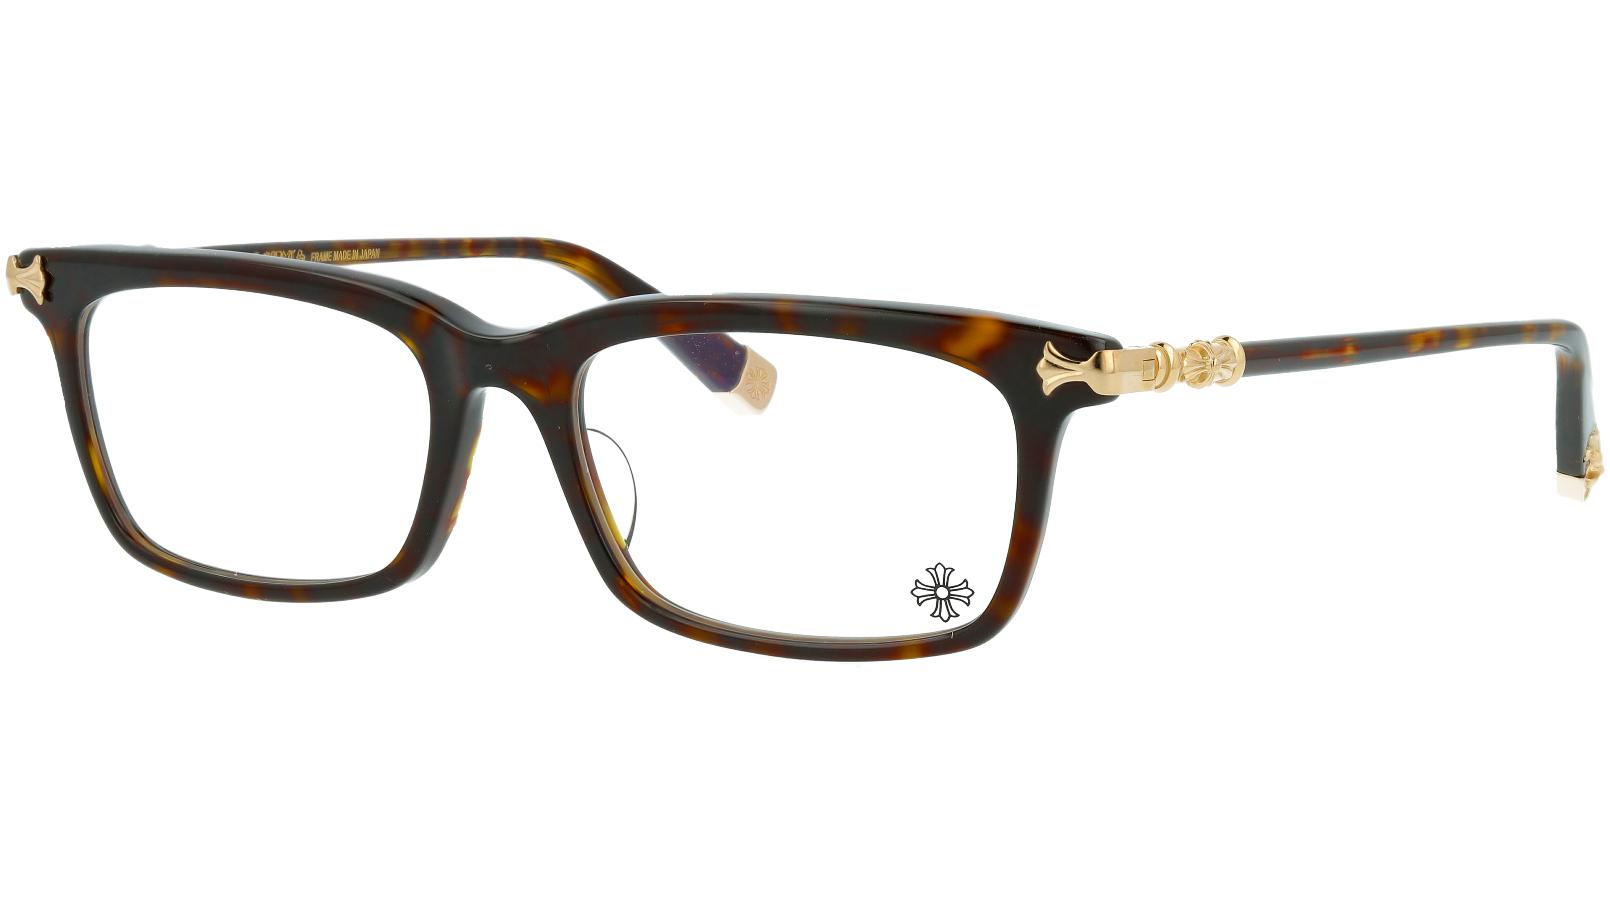 CHROME HEARTS FUN HATCH-A 12Y 54 MDT Glasses